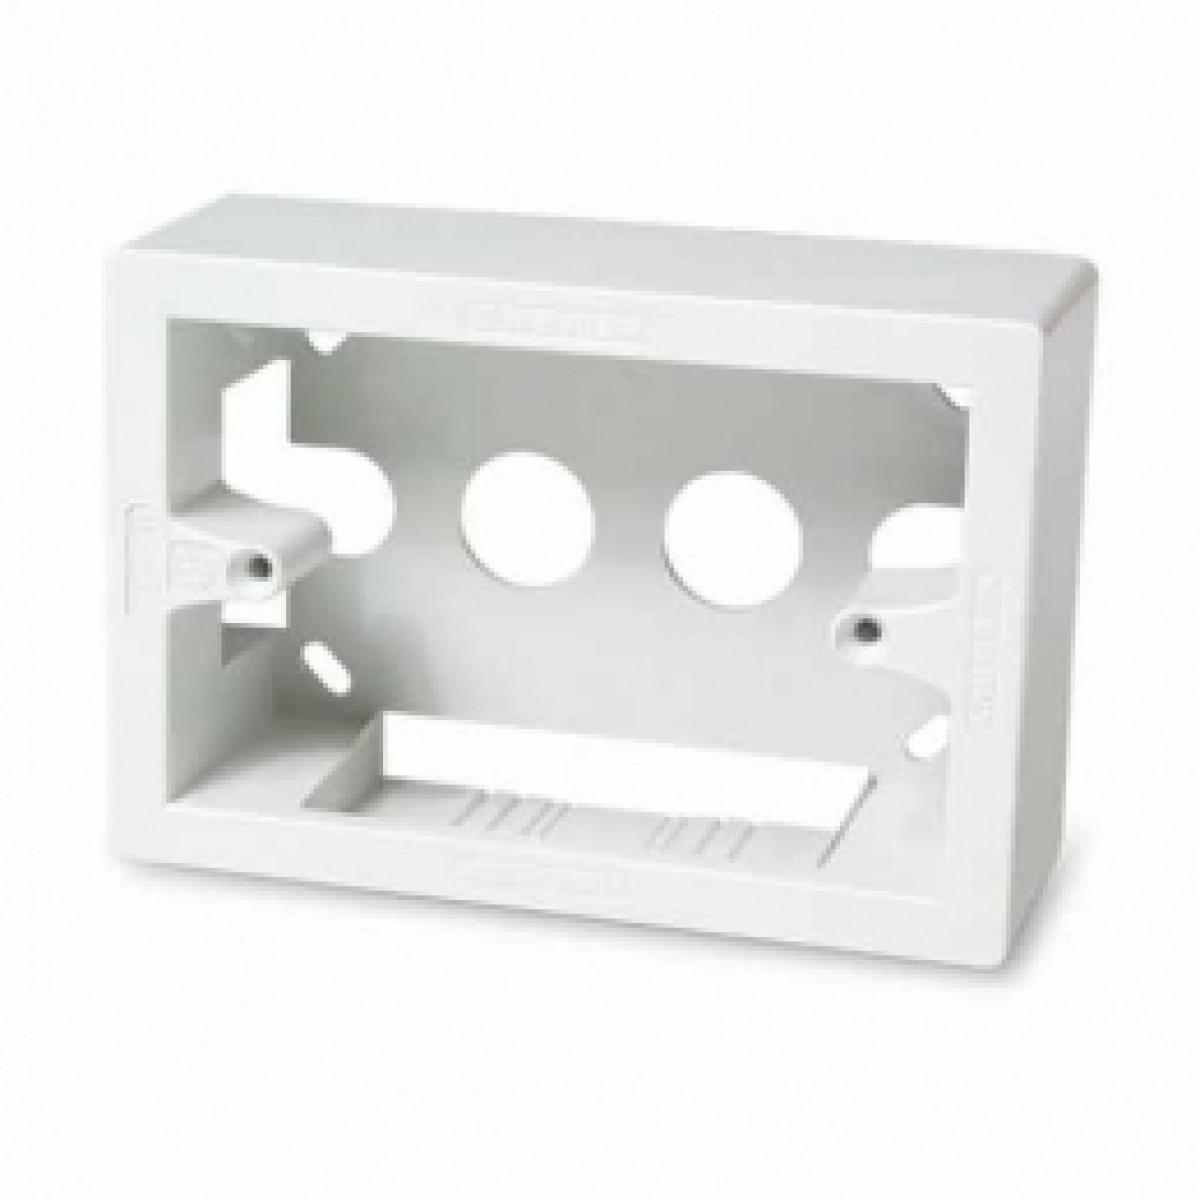 Scatola esterna universale 3 moduli bianca 00481 master